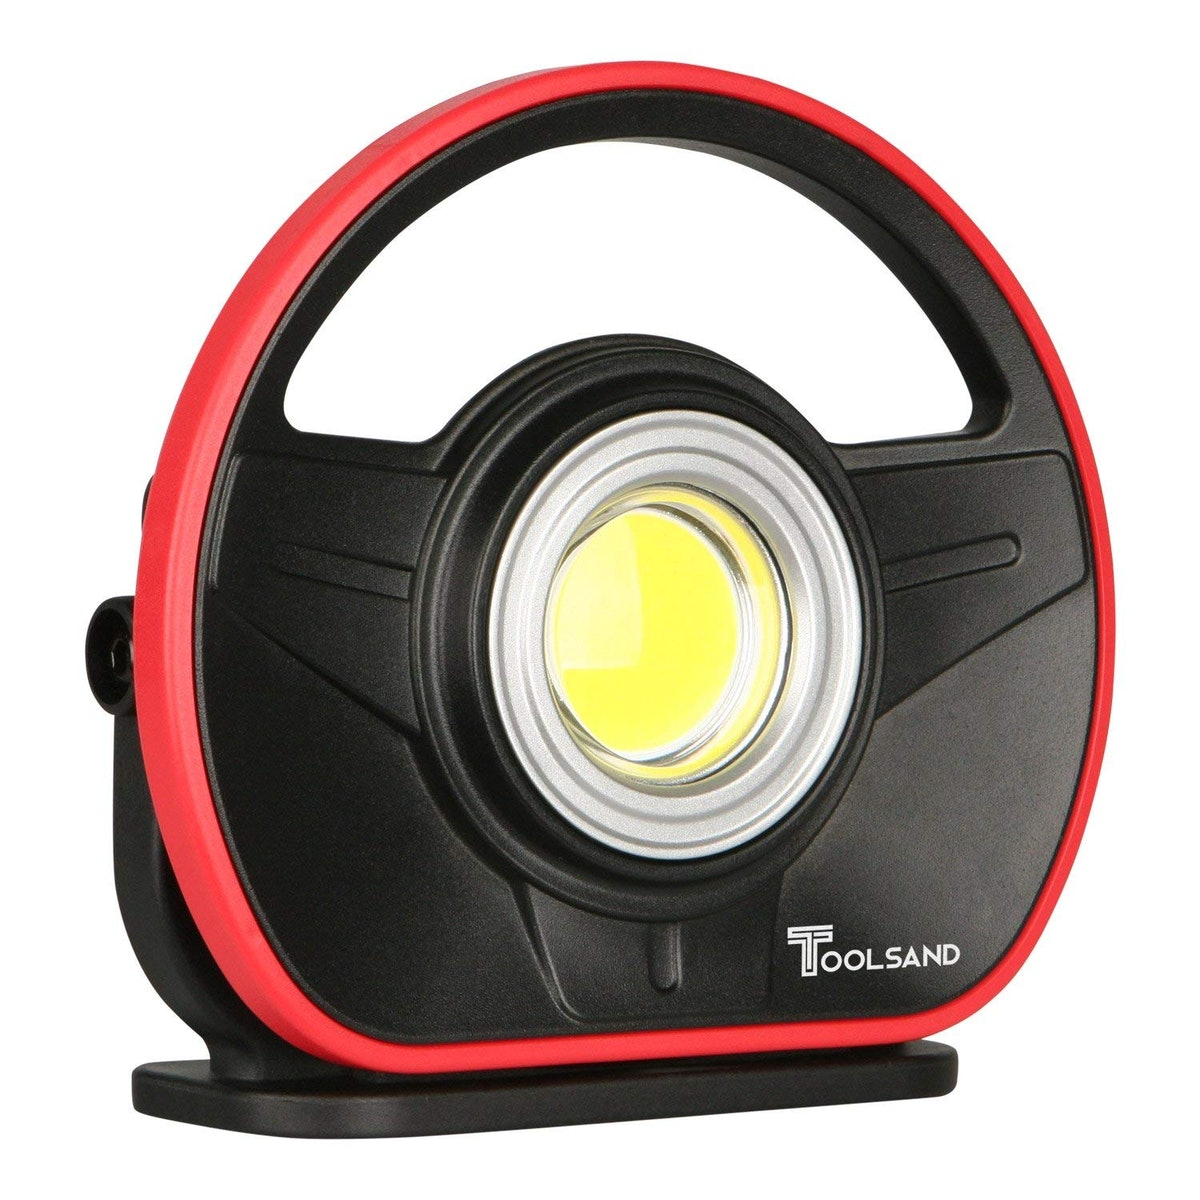 Toolsand Cordless LED Work Light